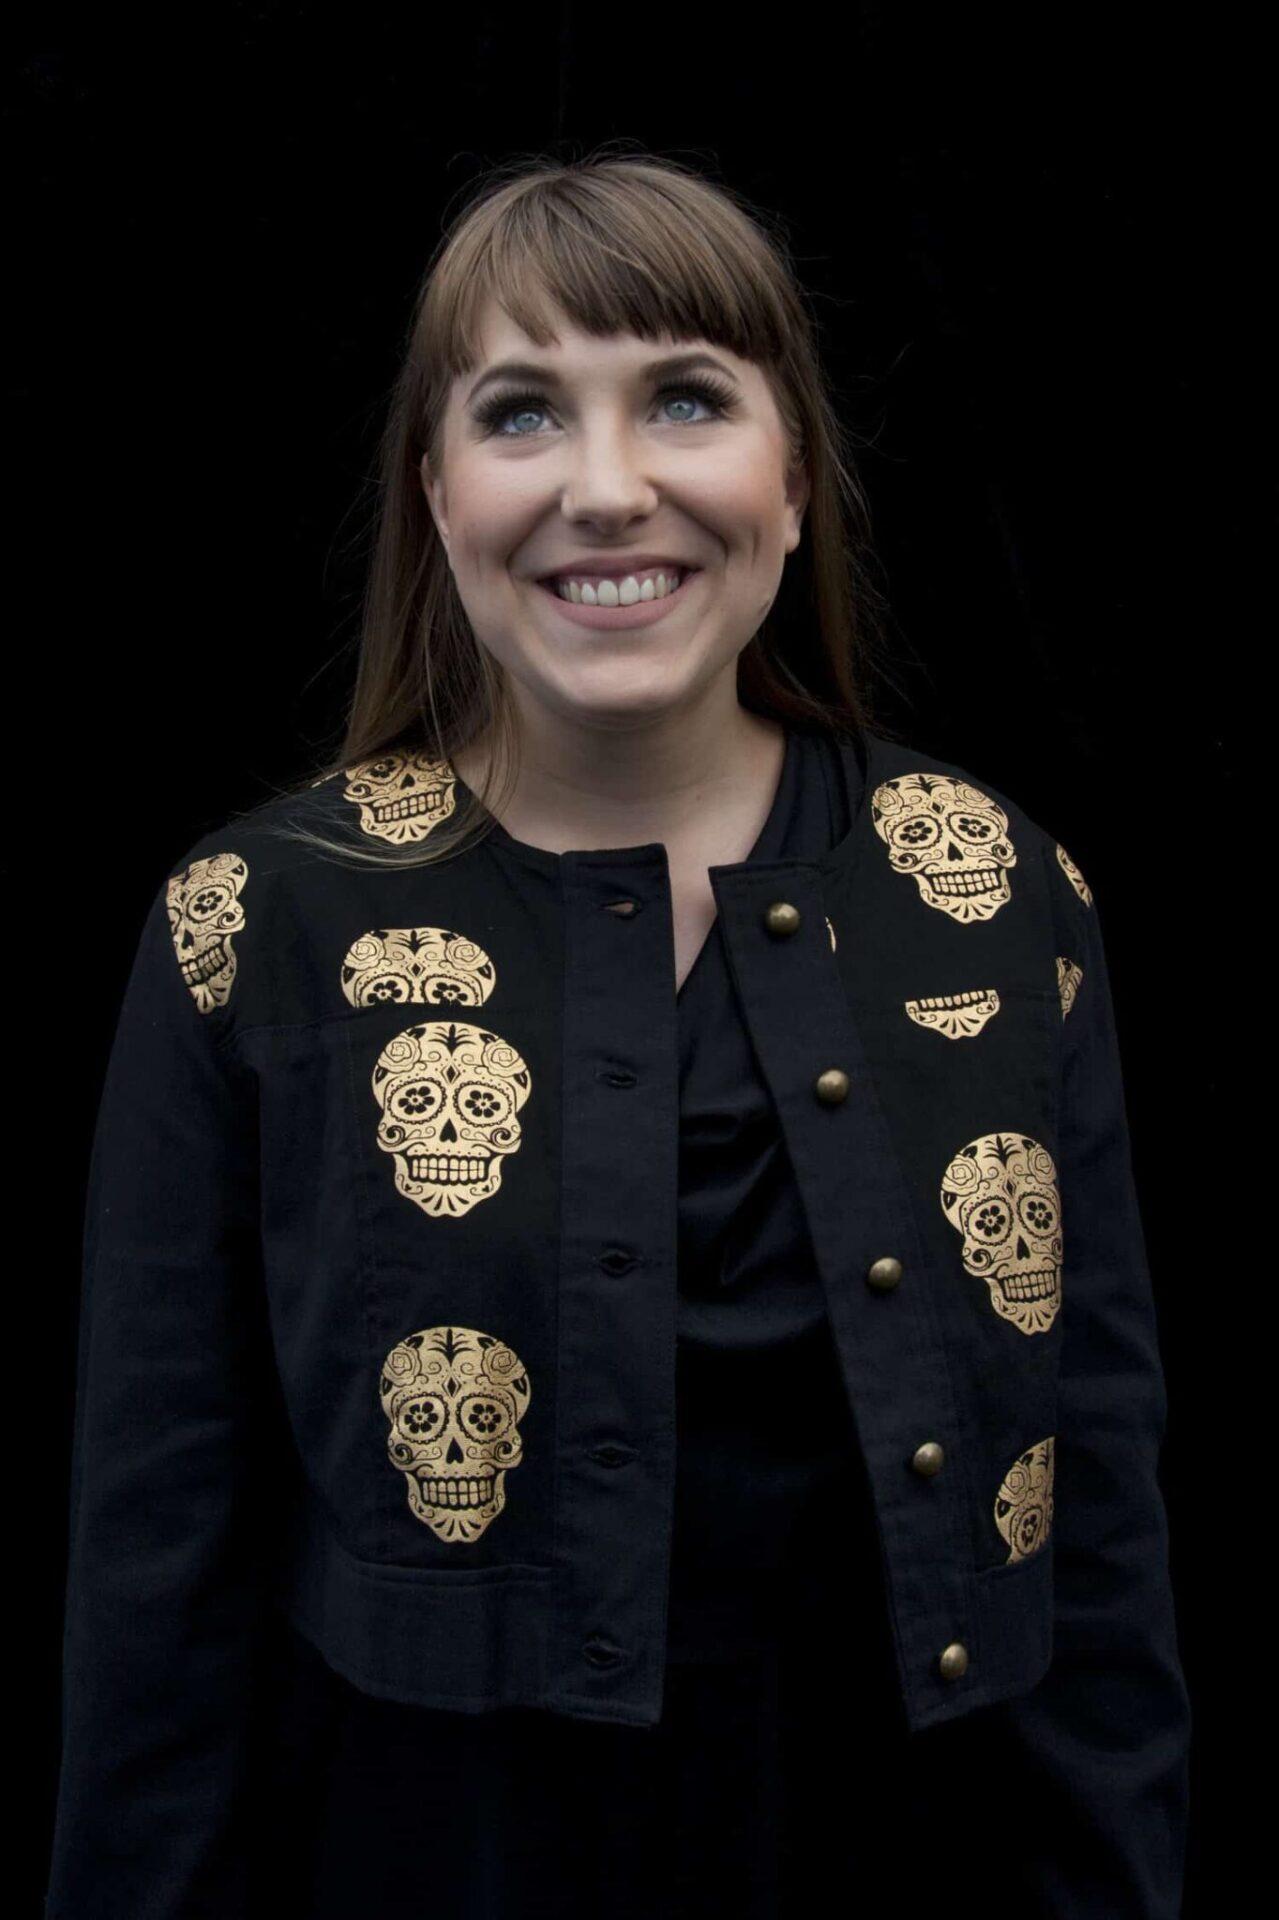 Black And Gold Skull Print Bomber Jacket By Jezenya Designs